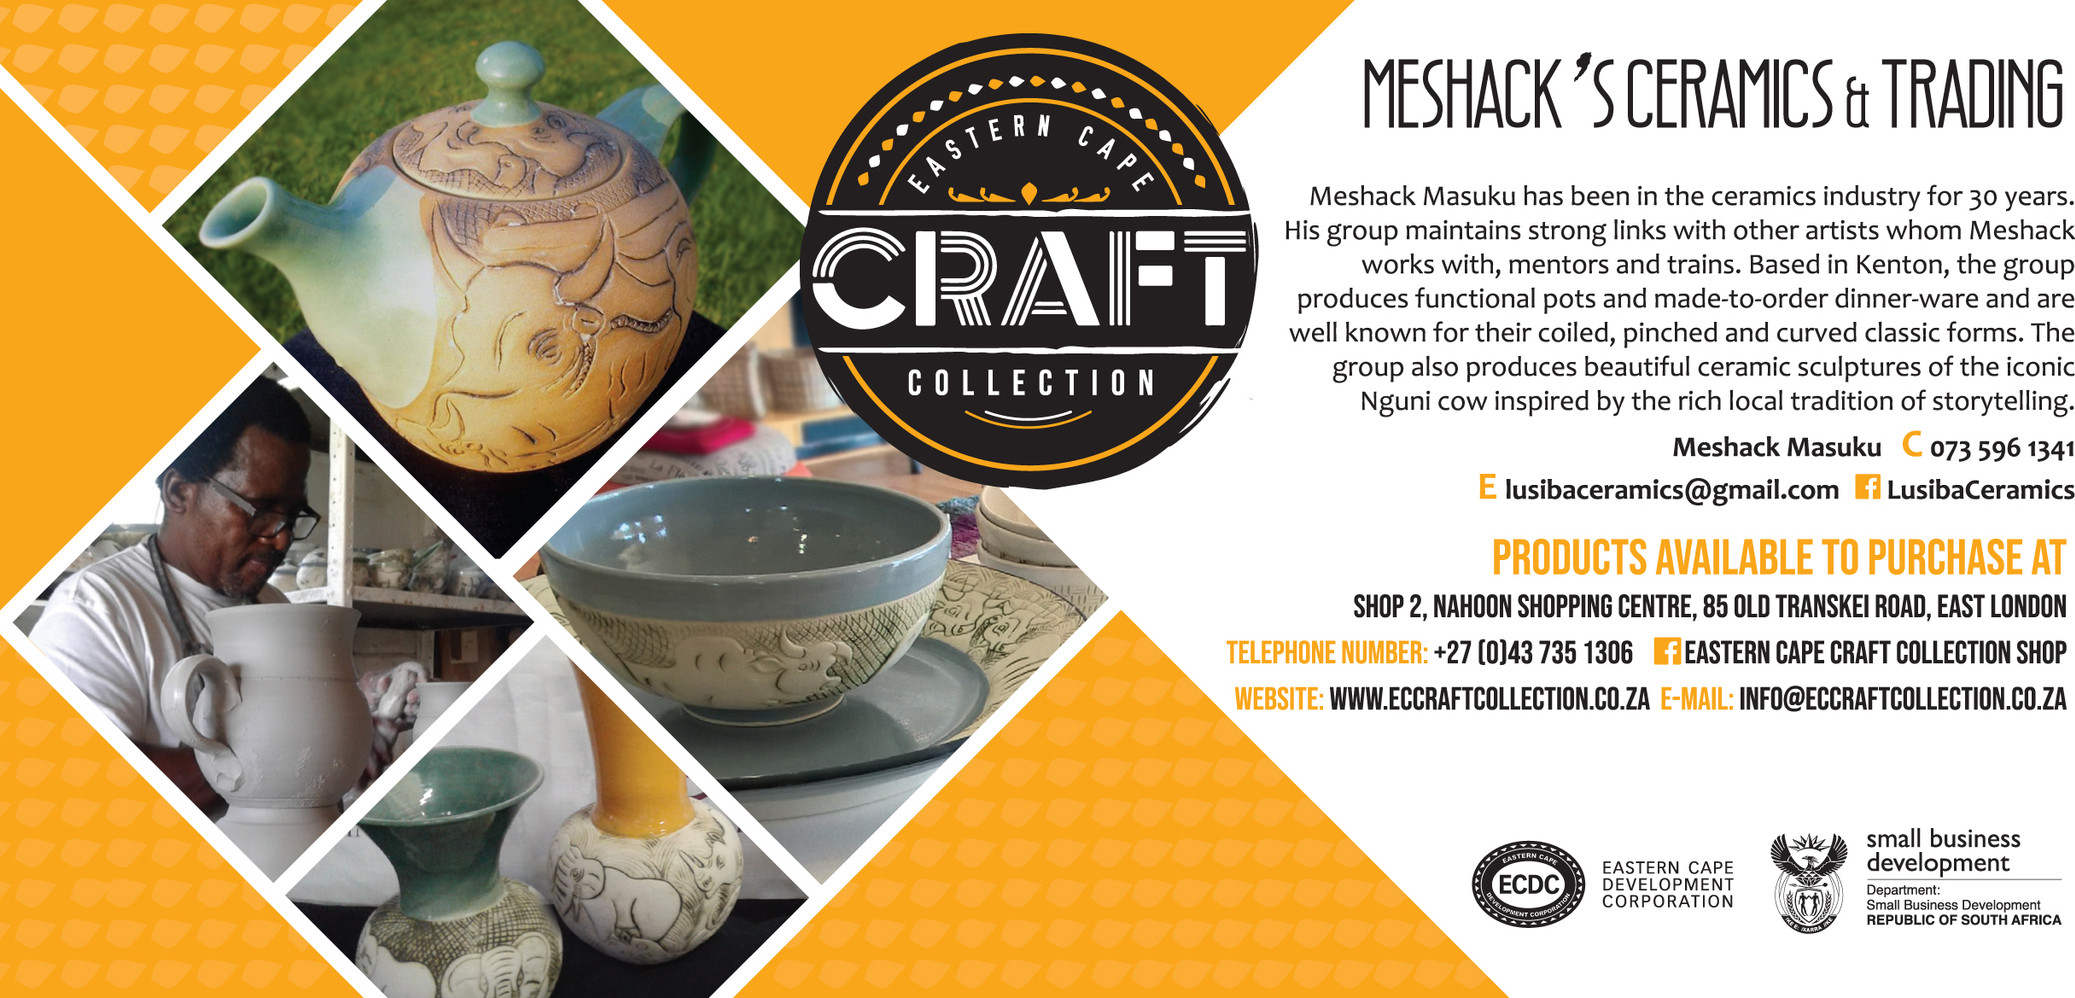 Meshack's Ceramics & Trading